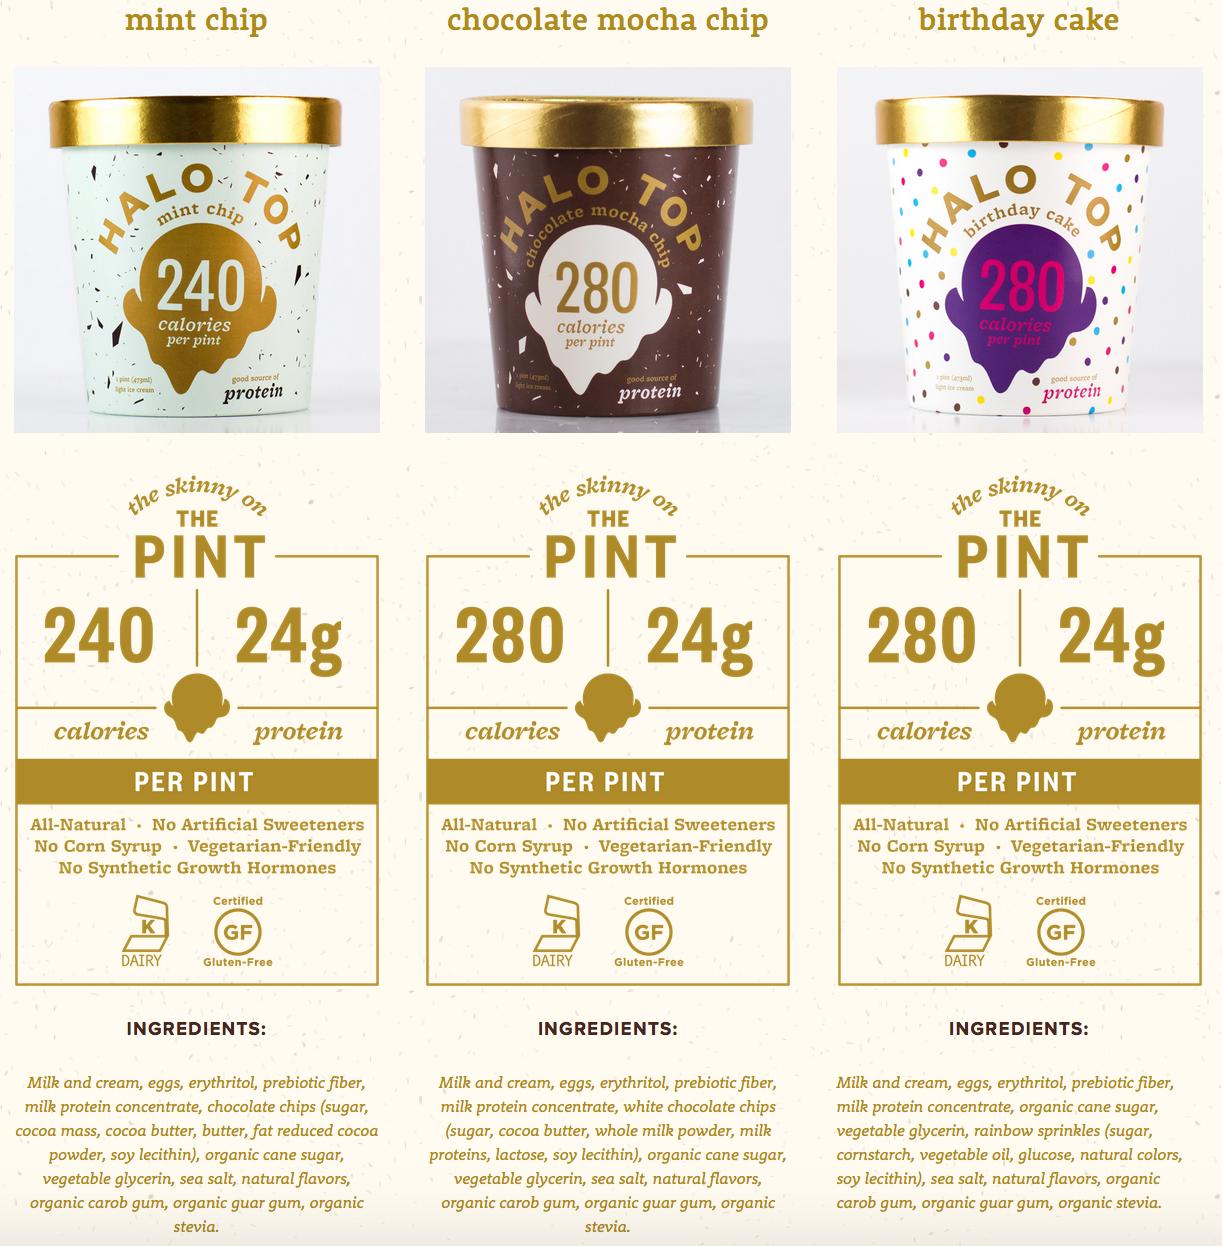 halo top healthy ice cream flavors 2